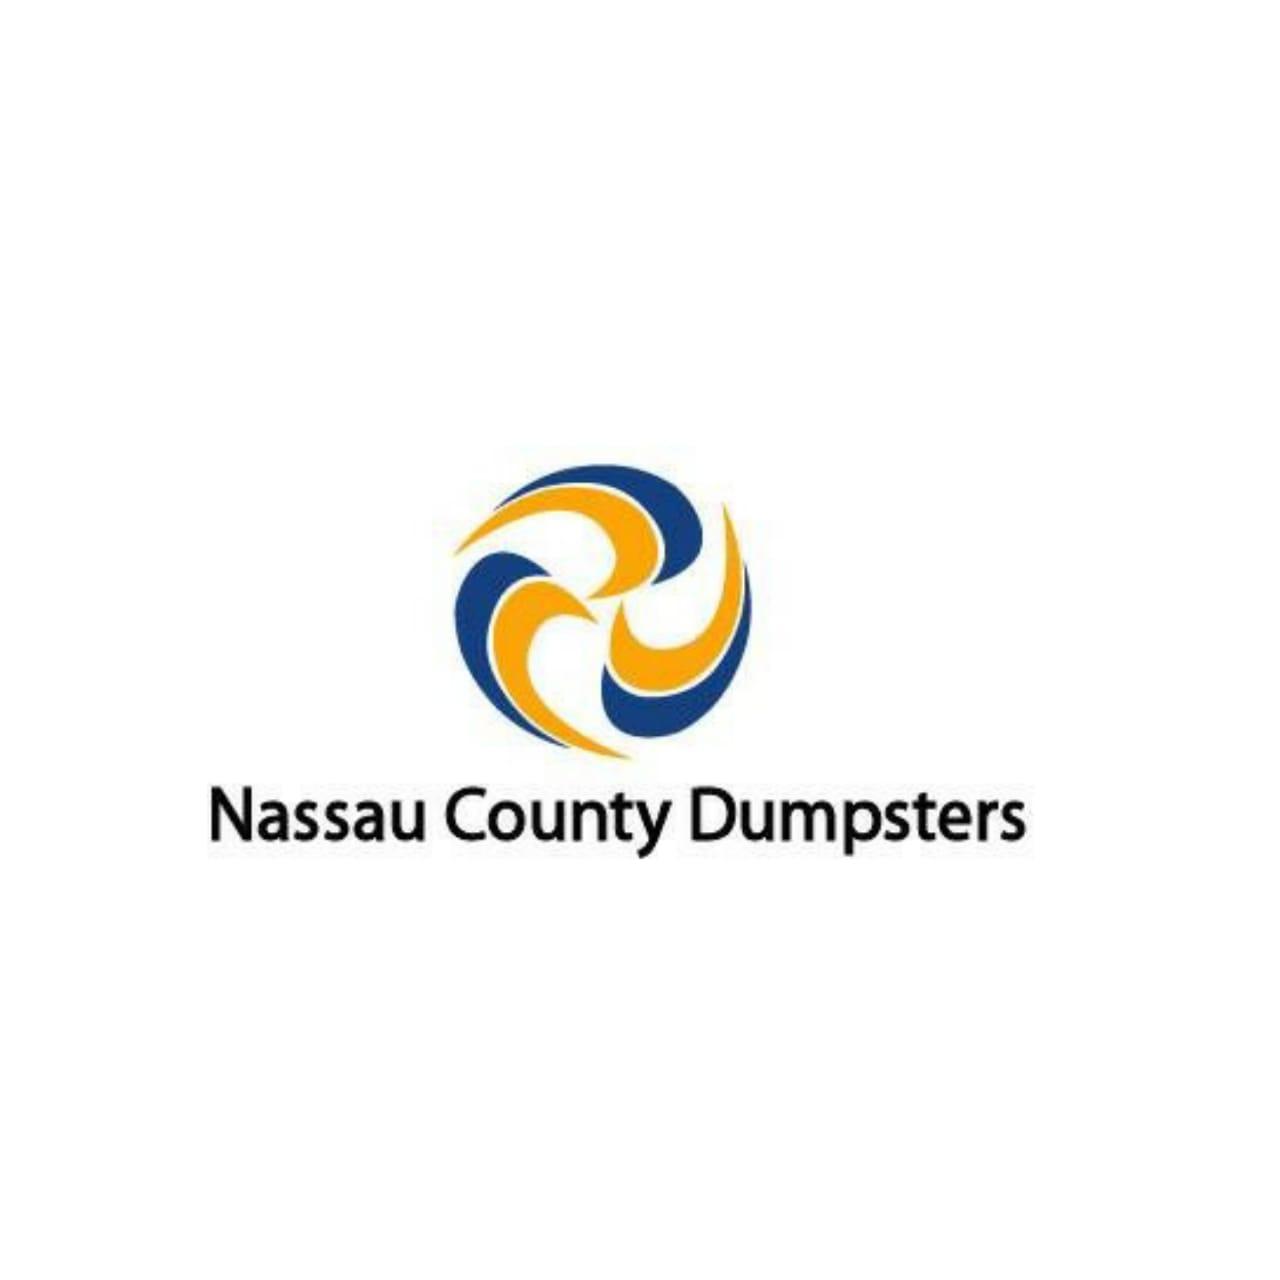 Nassau County Dumpsters